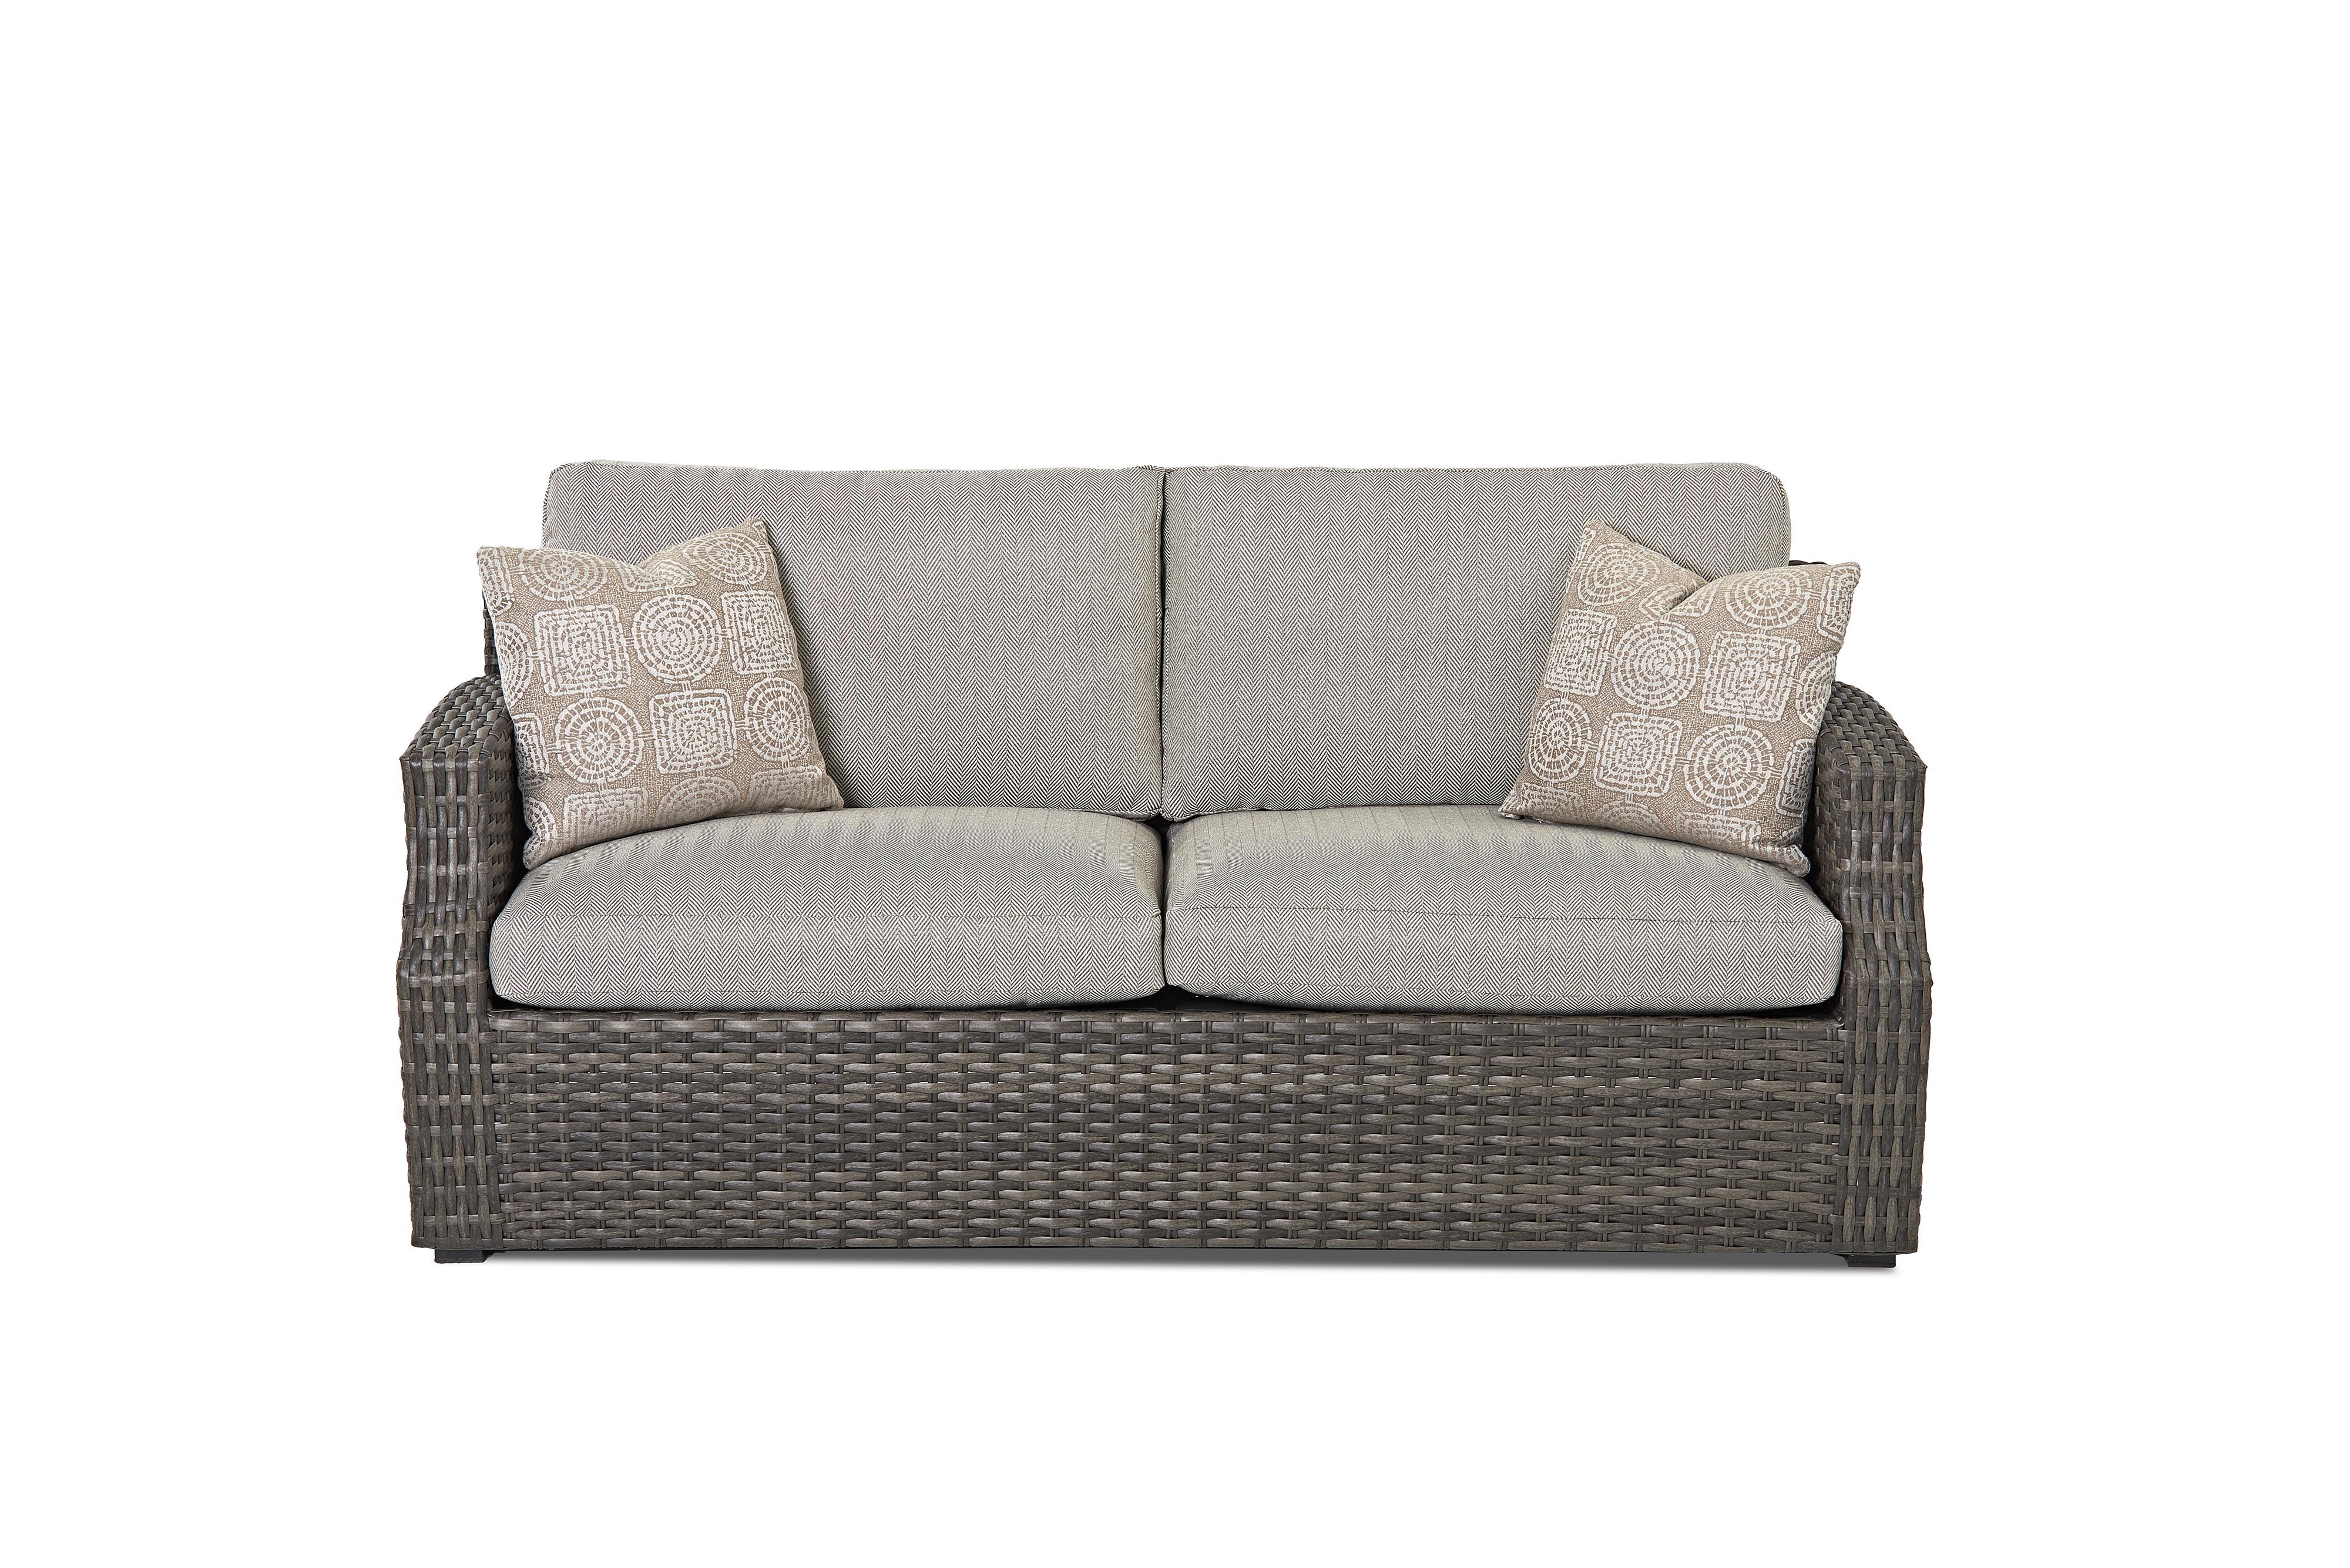 Cascade Outdoor Sofa by Klaussner Outdoor at Nassau Furniture and Mattress